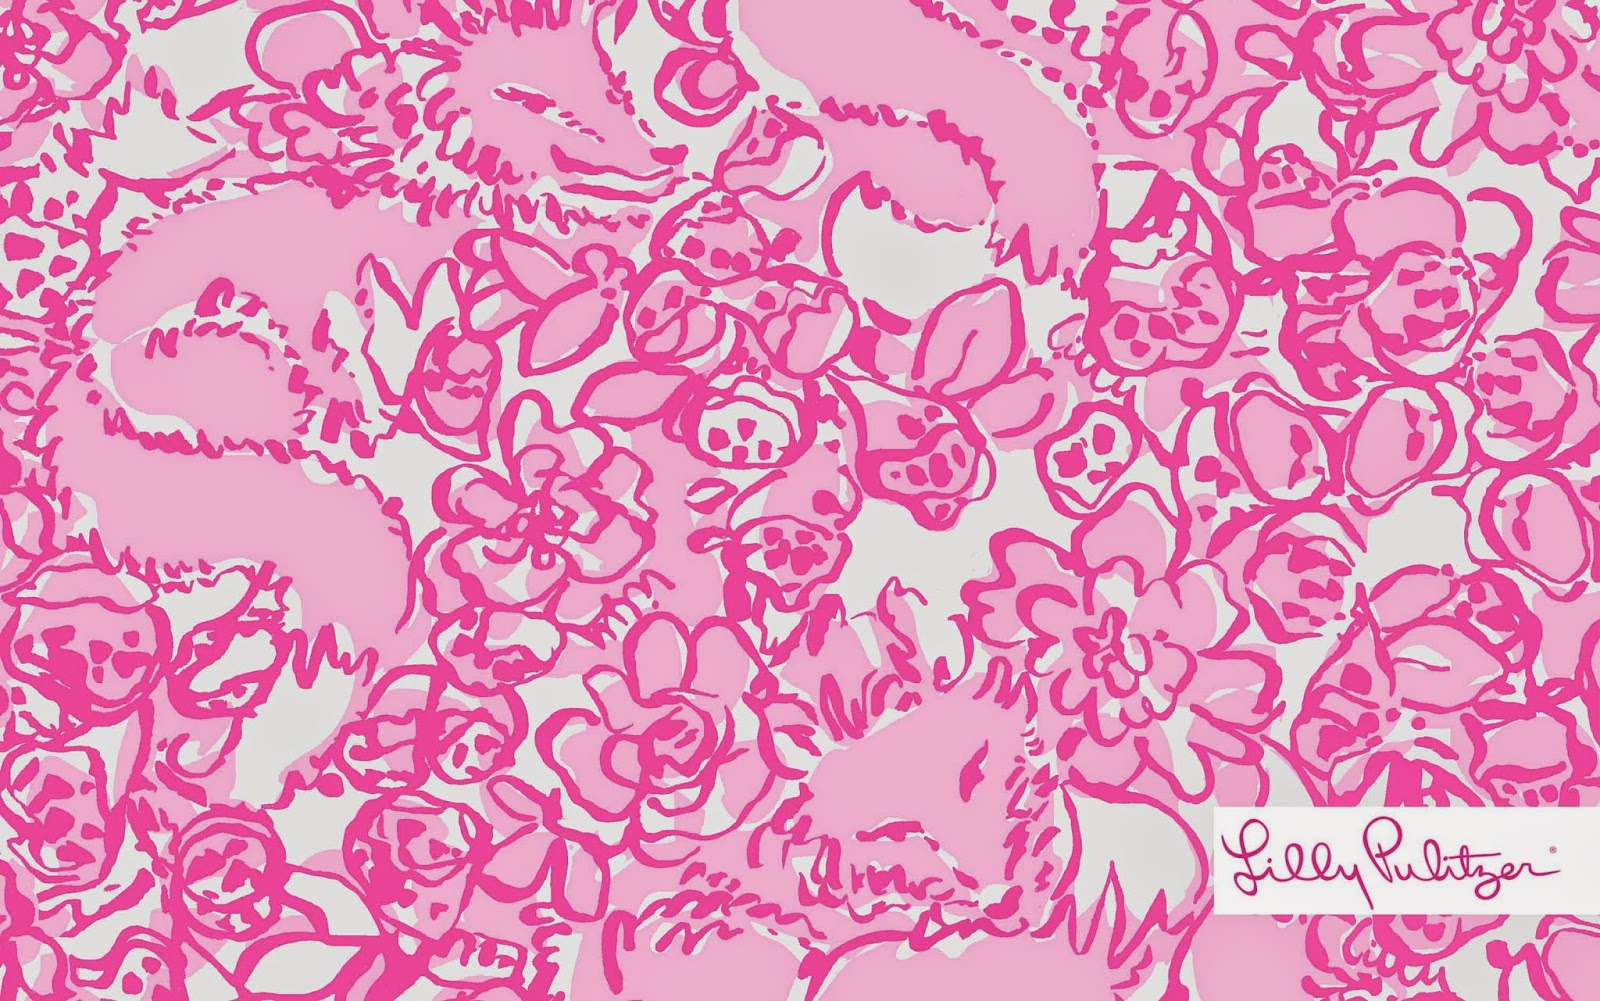 preppy ipad wallpaper canadianprep lilly desktop wallpaper